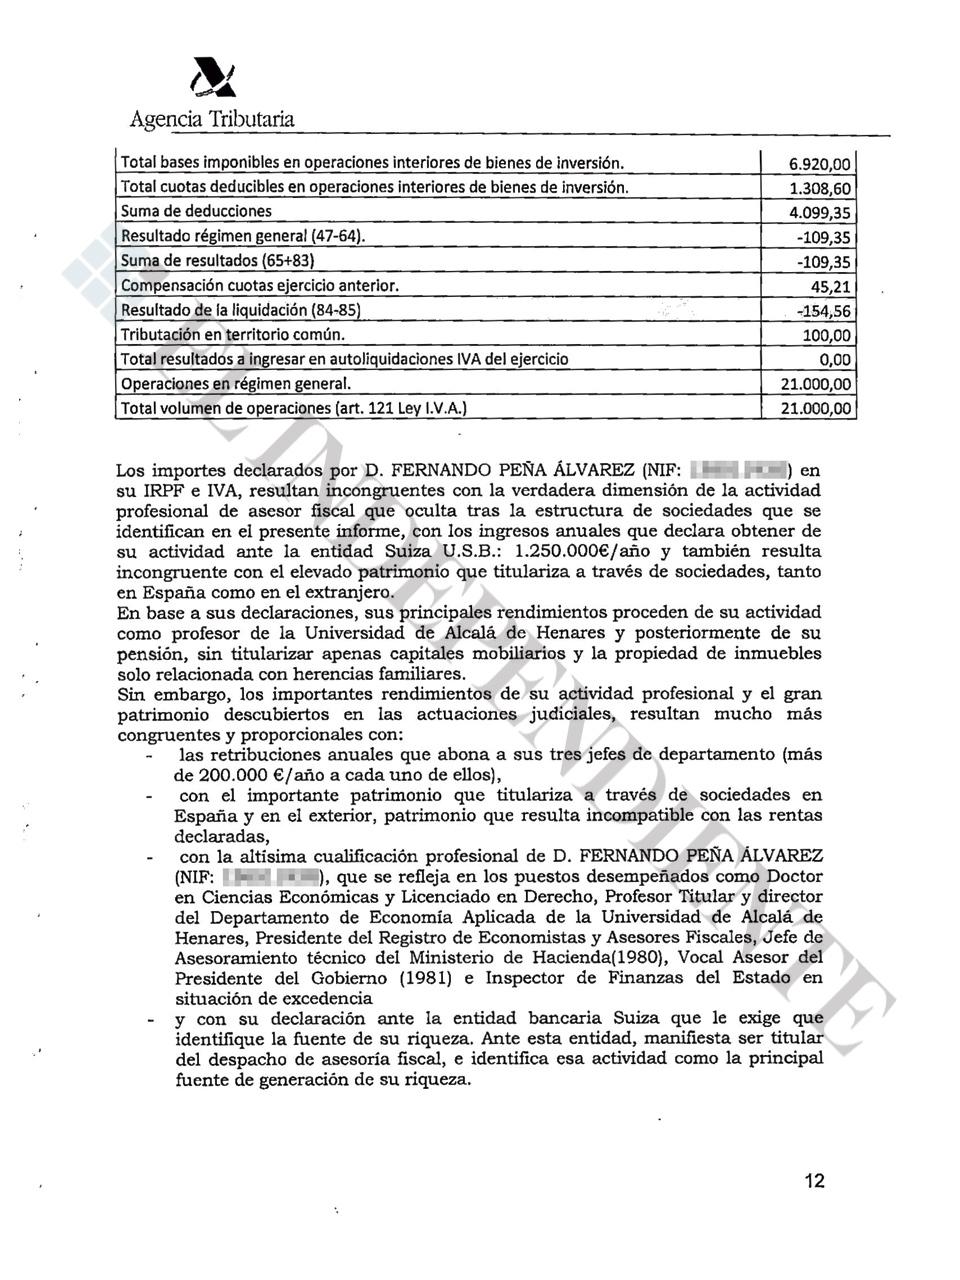 Agencia Tributaria - Fernando Peña